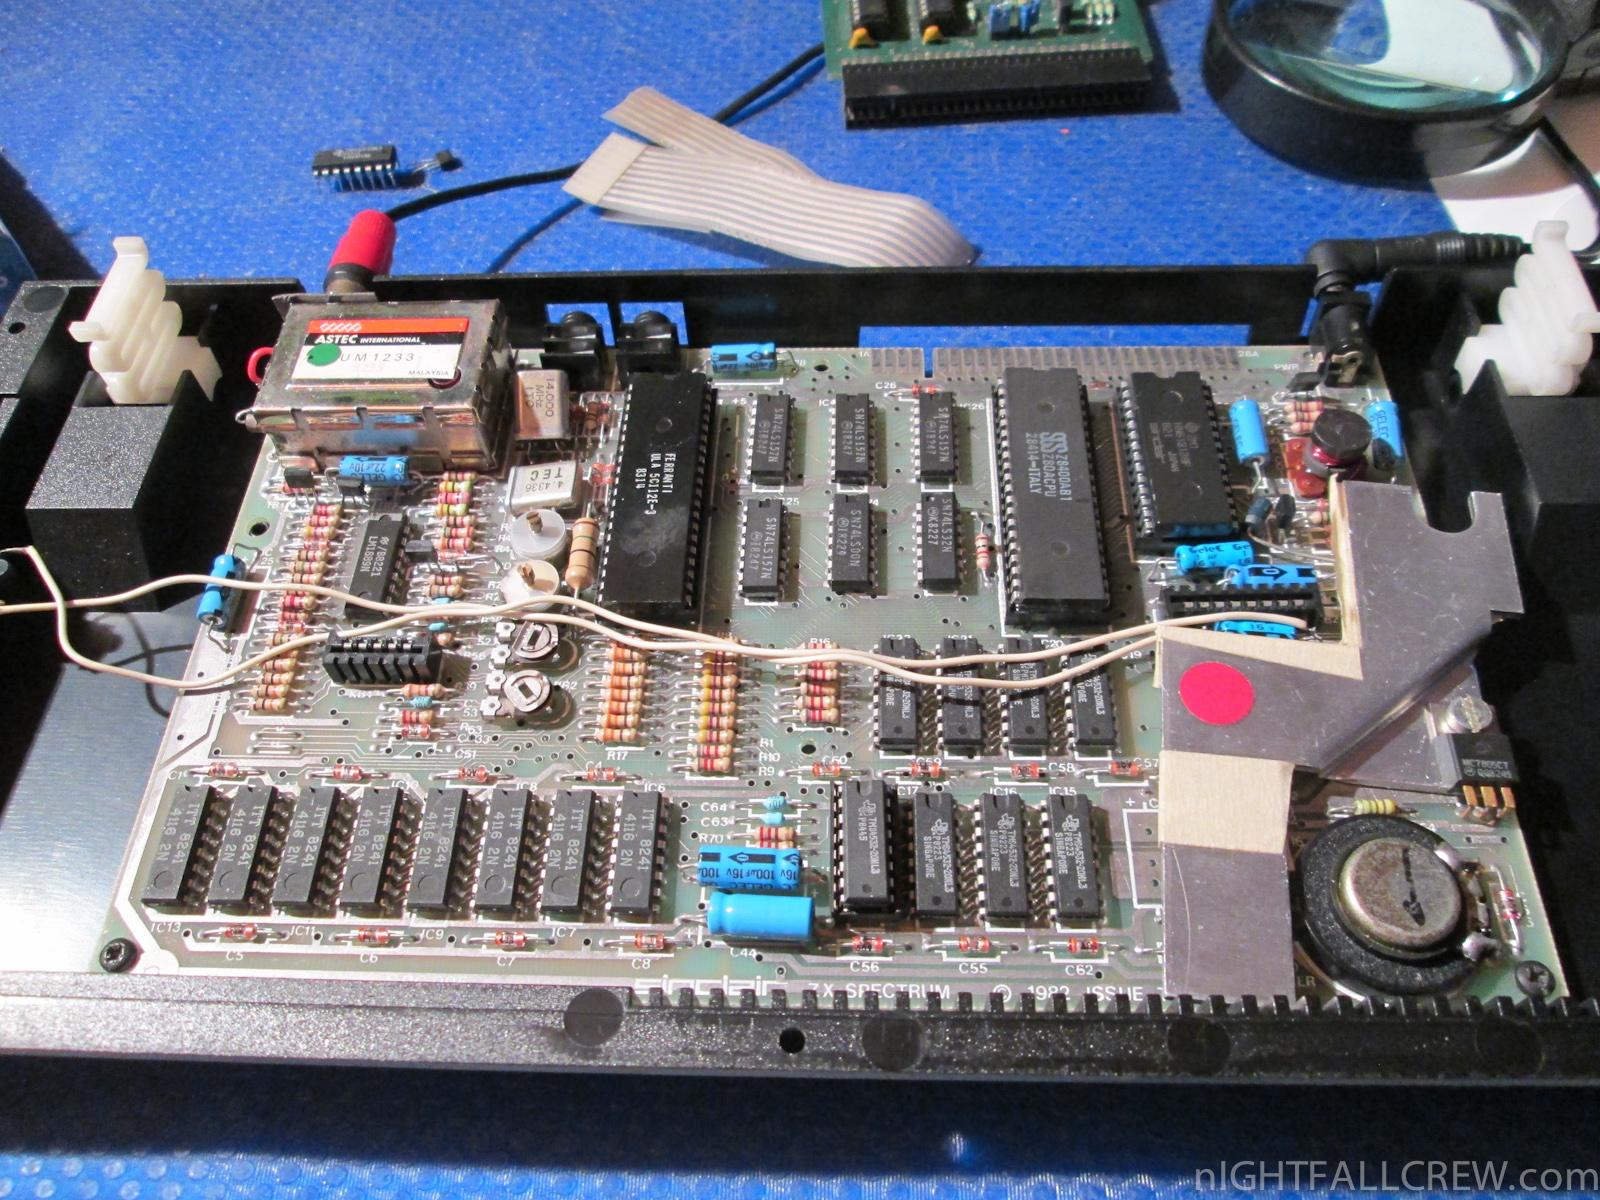 Sinclair Spectrum Break Recovering Repair Updated Nightfall The Basic Digital Computing Circuitry Used In